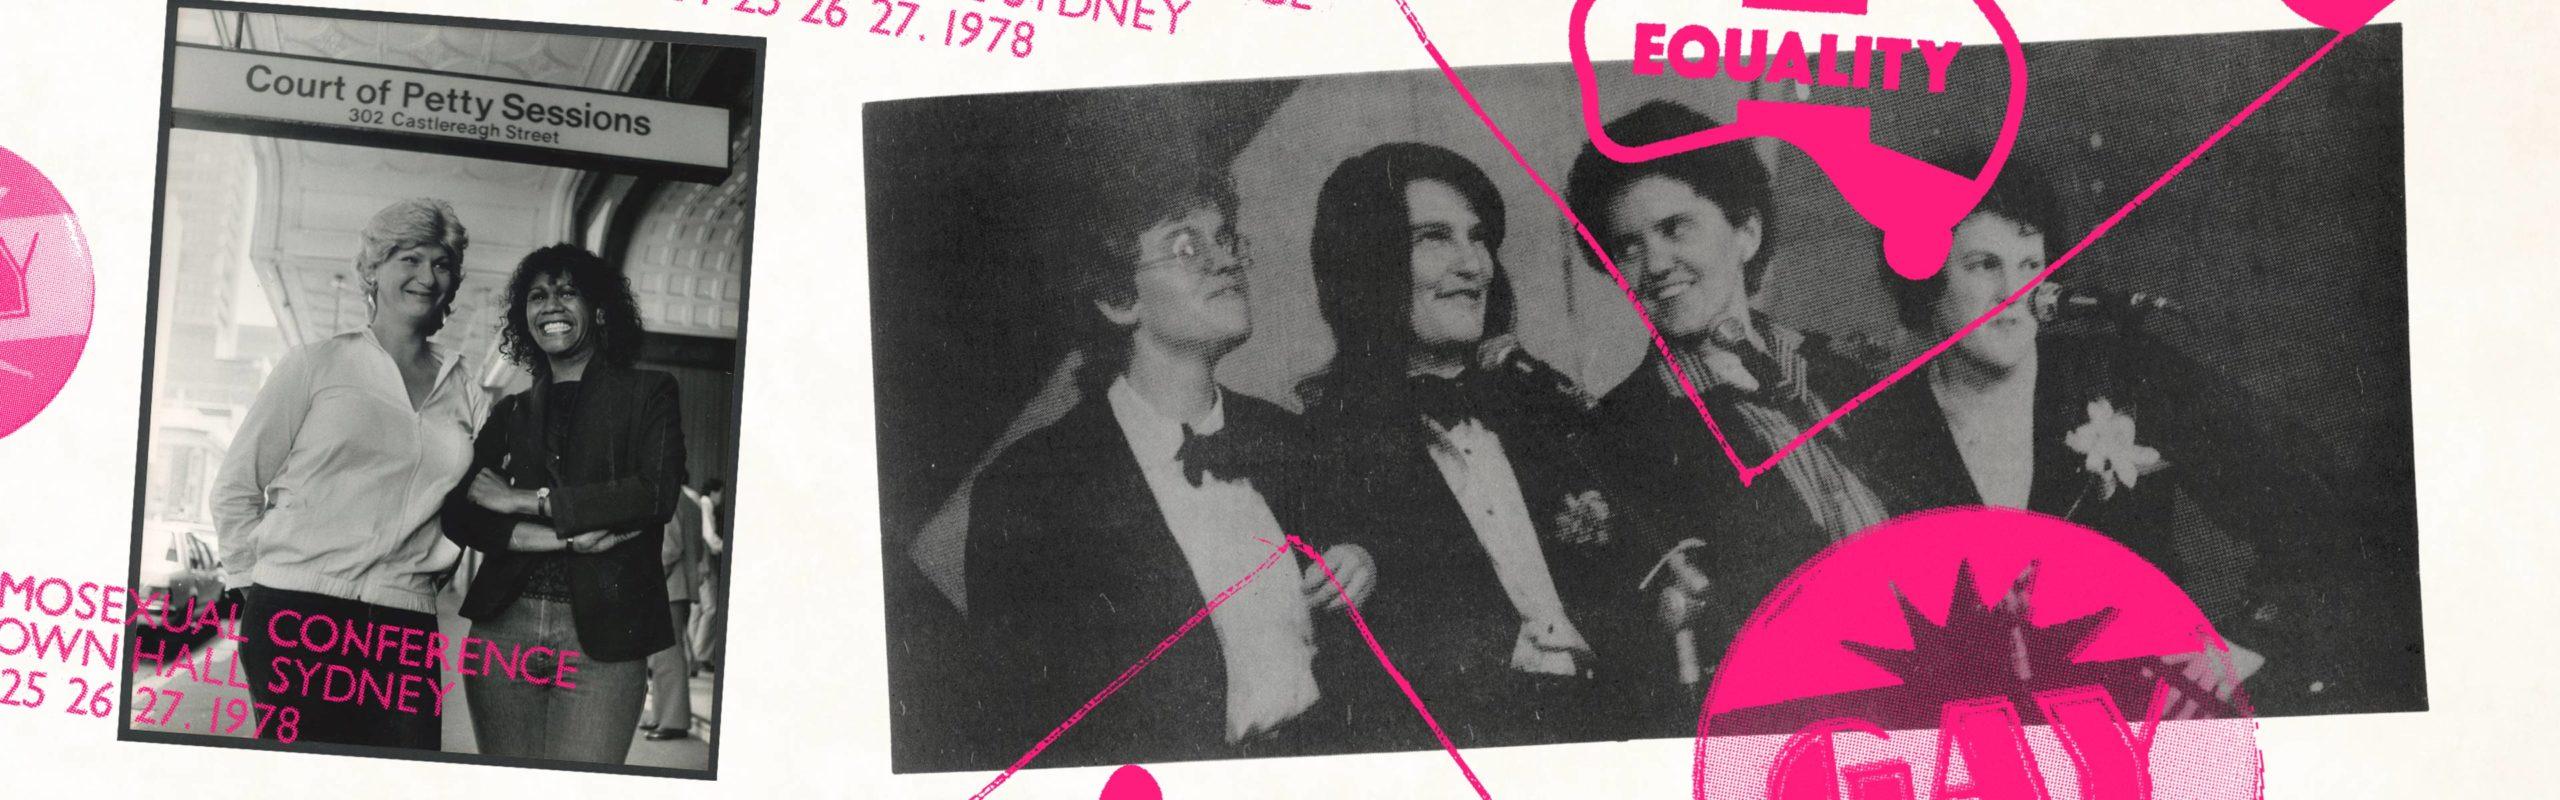 australian-gay-lesbian-archives-banner-7